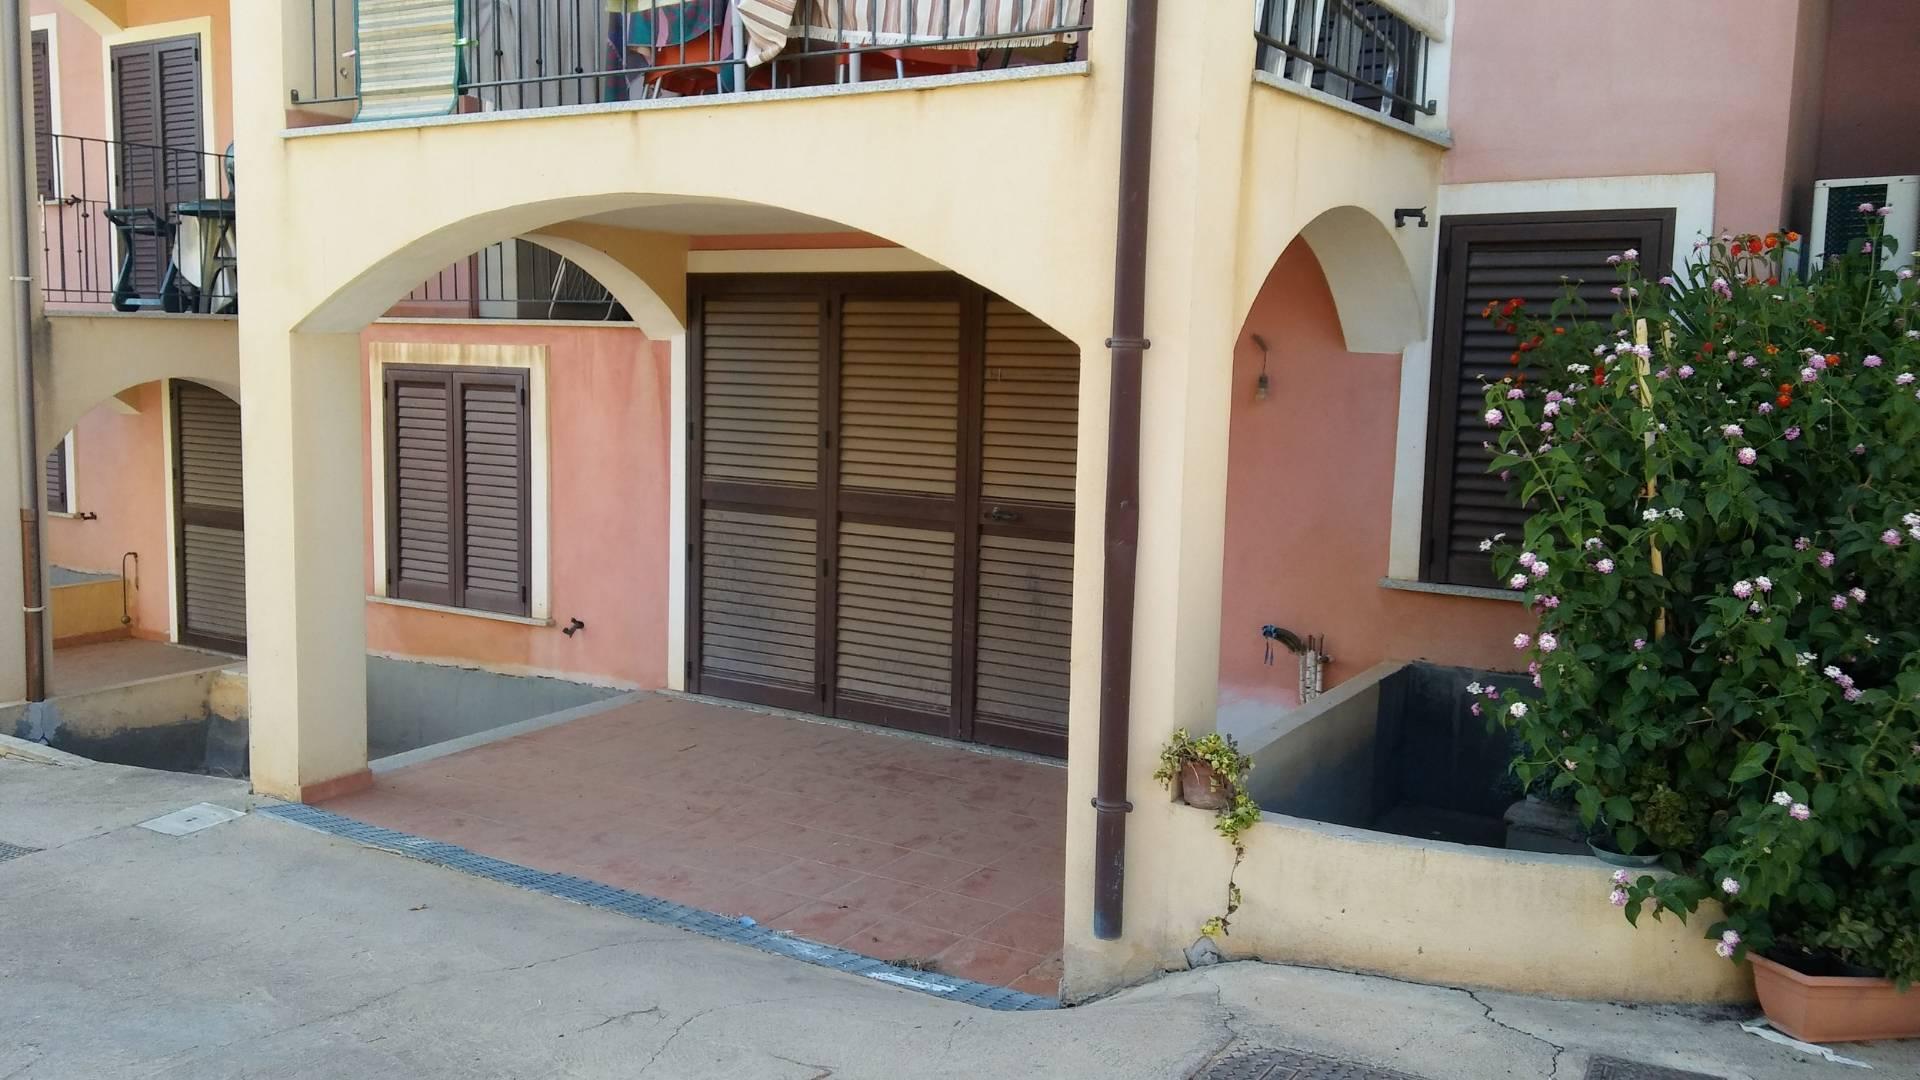 Appartamento in vendita a Baunei, 2 locali, zona Località: S.aMariaNavarrese, Trattative riservate | CambioCasa.it